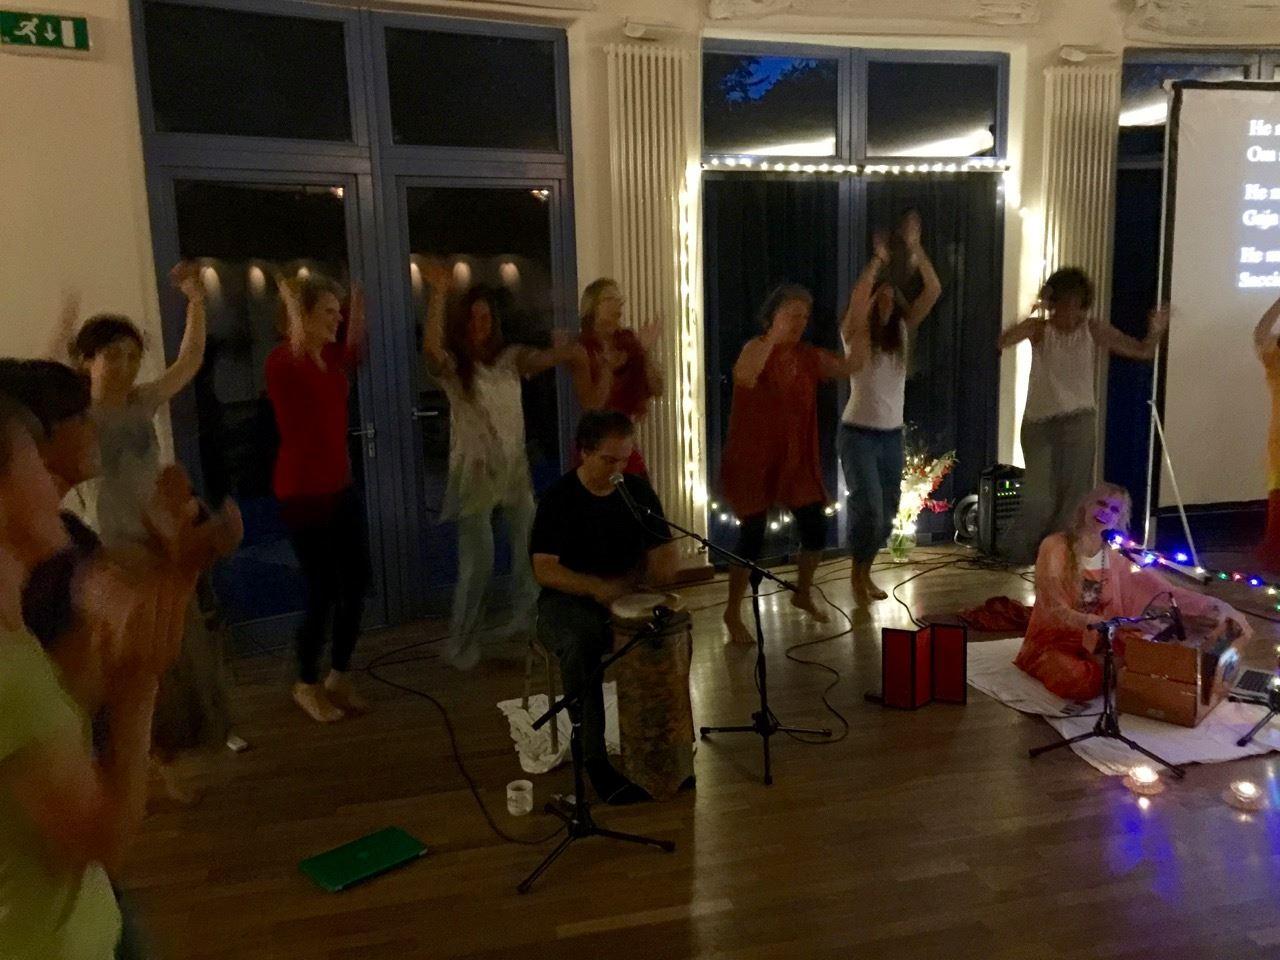 Chant Club Dancers